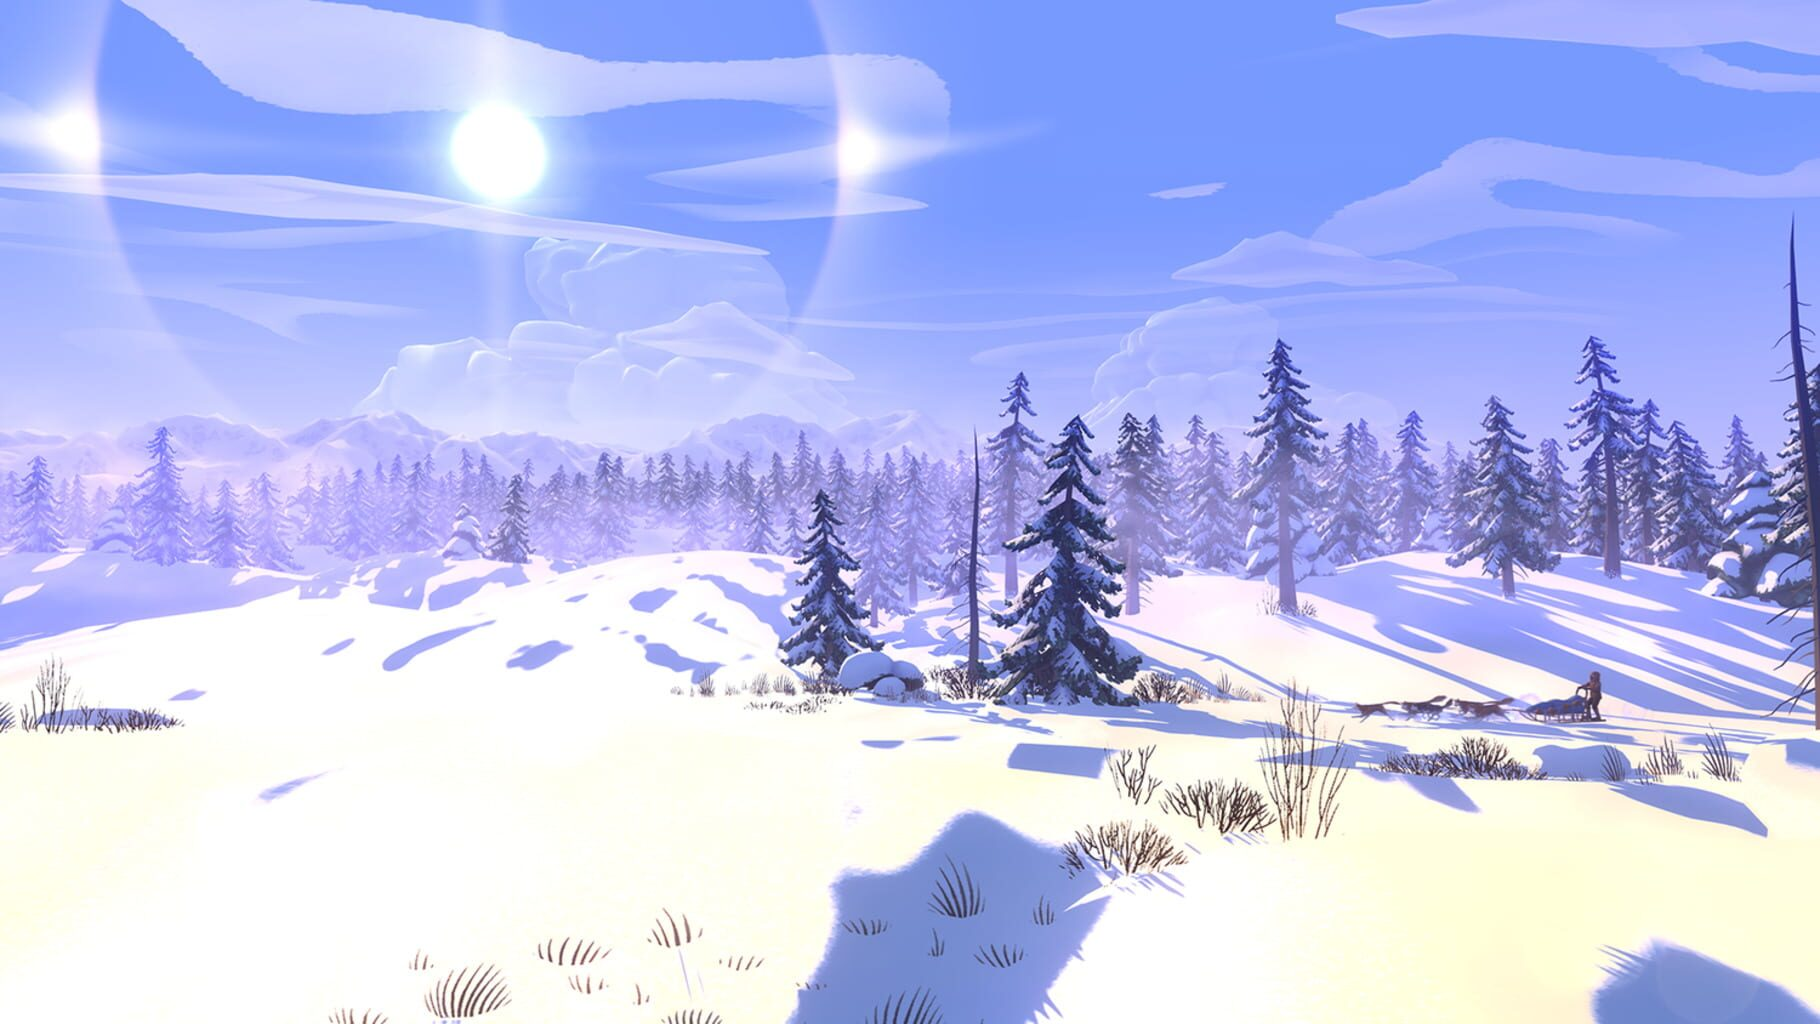 Gameplay Screenshot from The Red Lantern